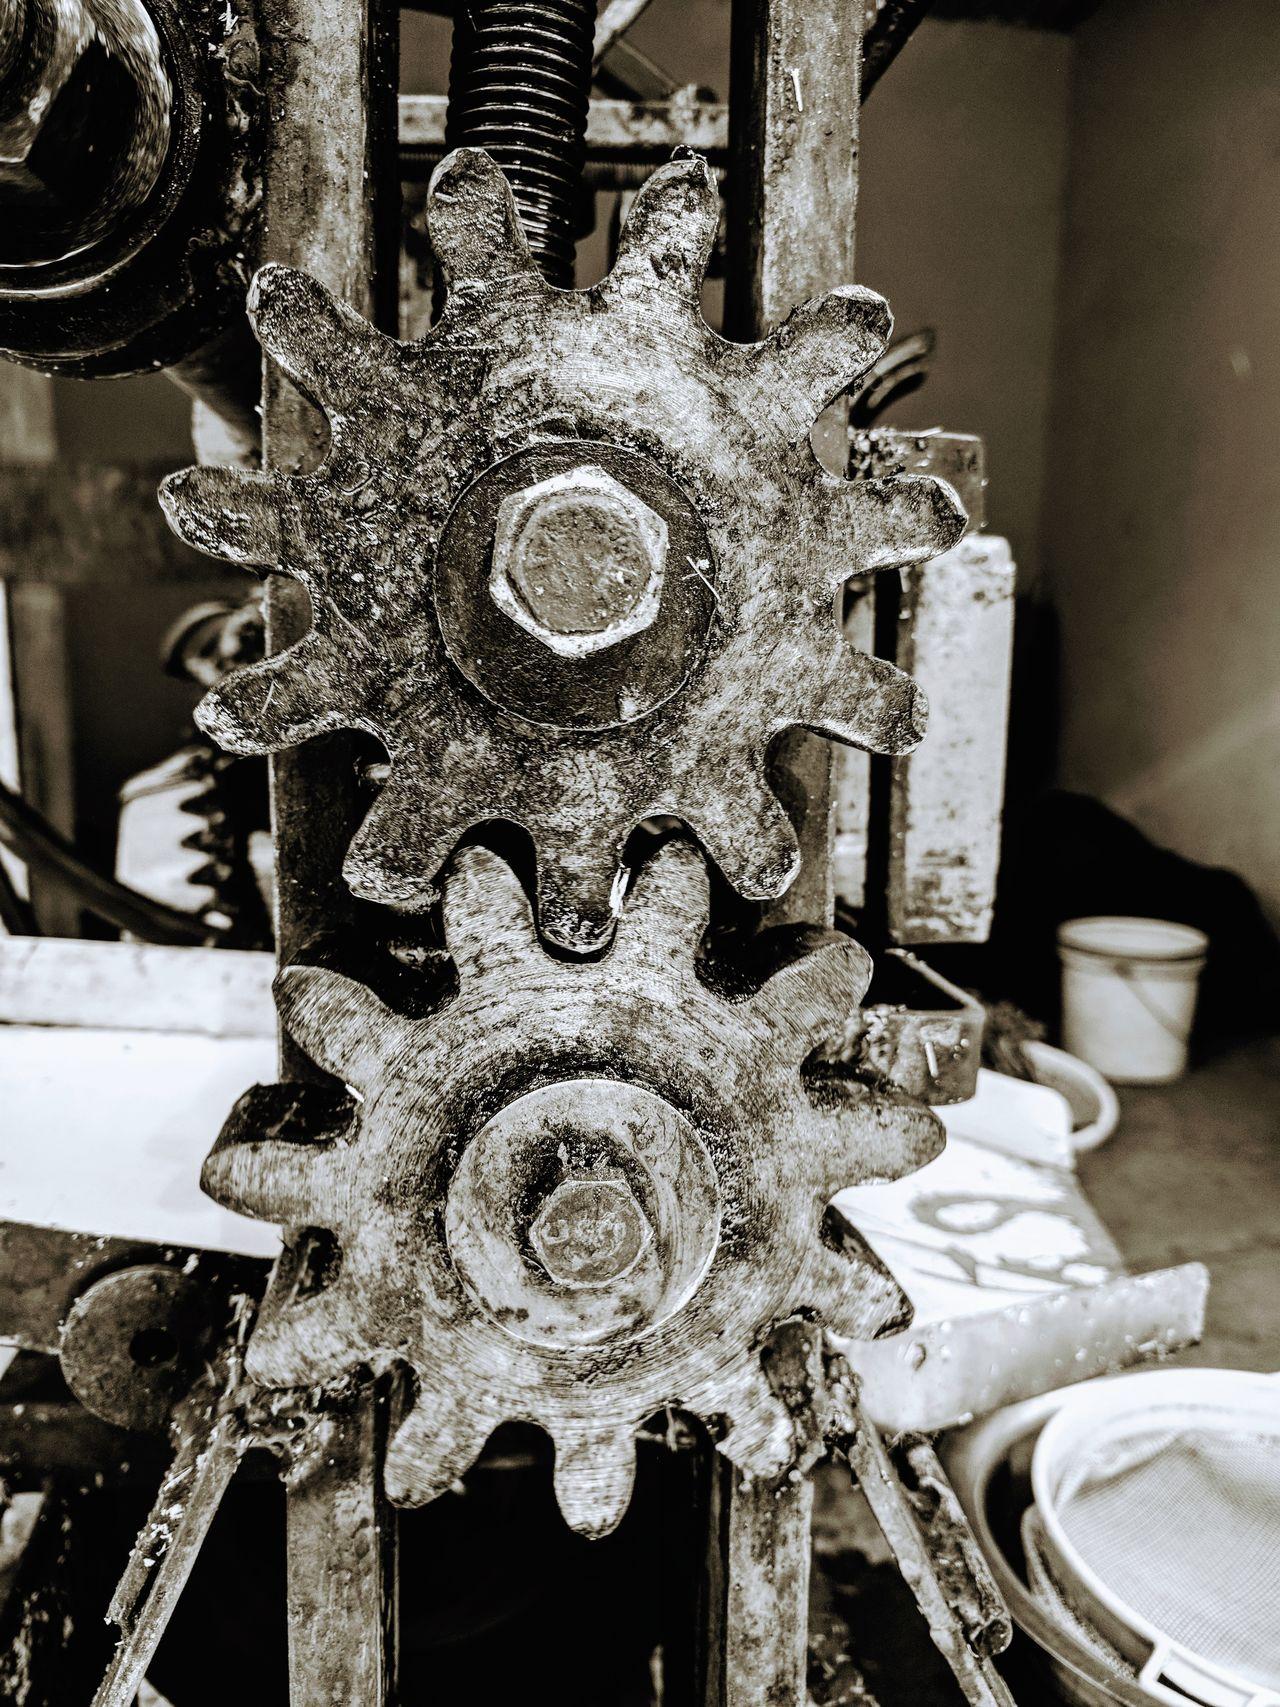 Mechanical gears⚙️⚙️ Nexus 6p Photography Sugarcane Juice Machine Sugar Cane Juice EyeEmNewHere Welcome To Black The Secret Spaces Art Is Everywhere ミーノー!! Iloveyoujyotsna♥️ Muaaahhhh😘😘😘💋💋💋 PatelMohit Photography Mojo-Jojo